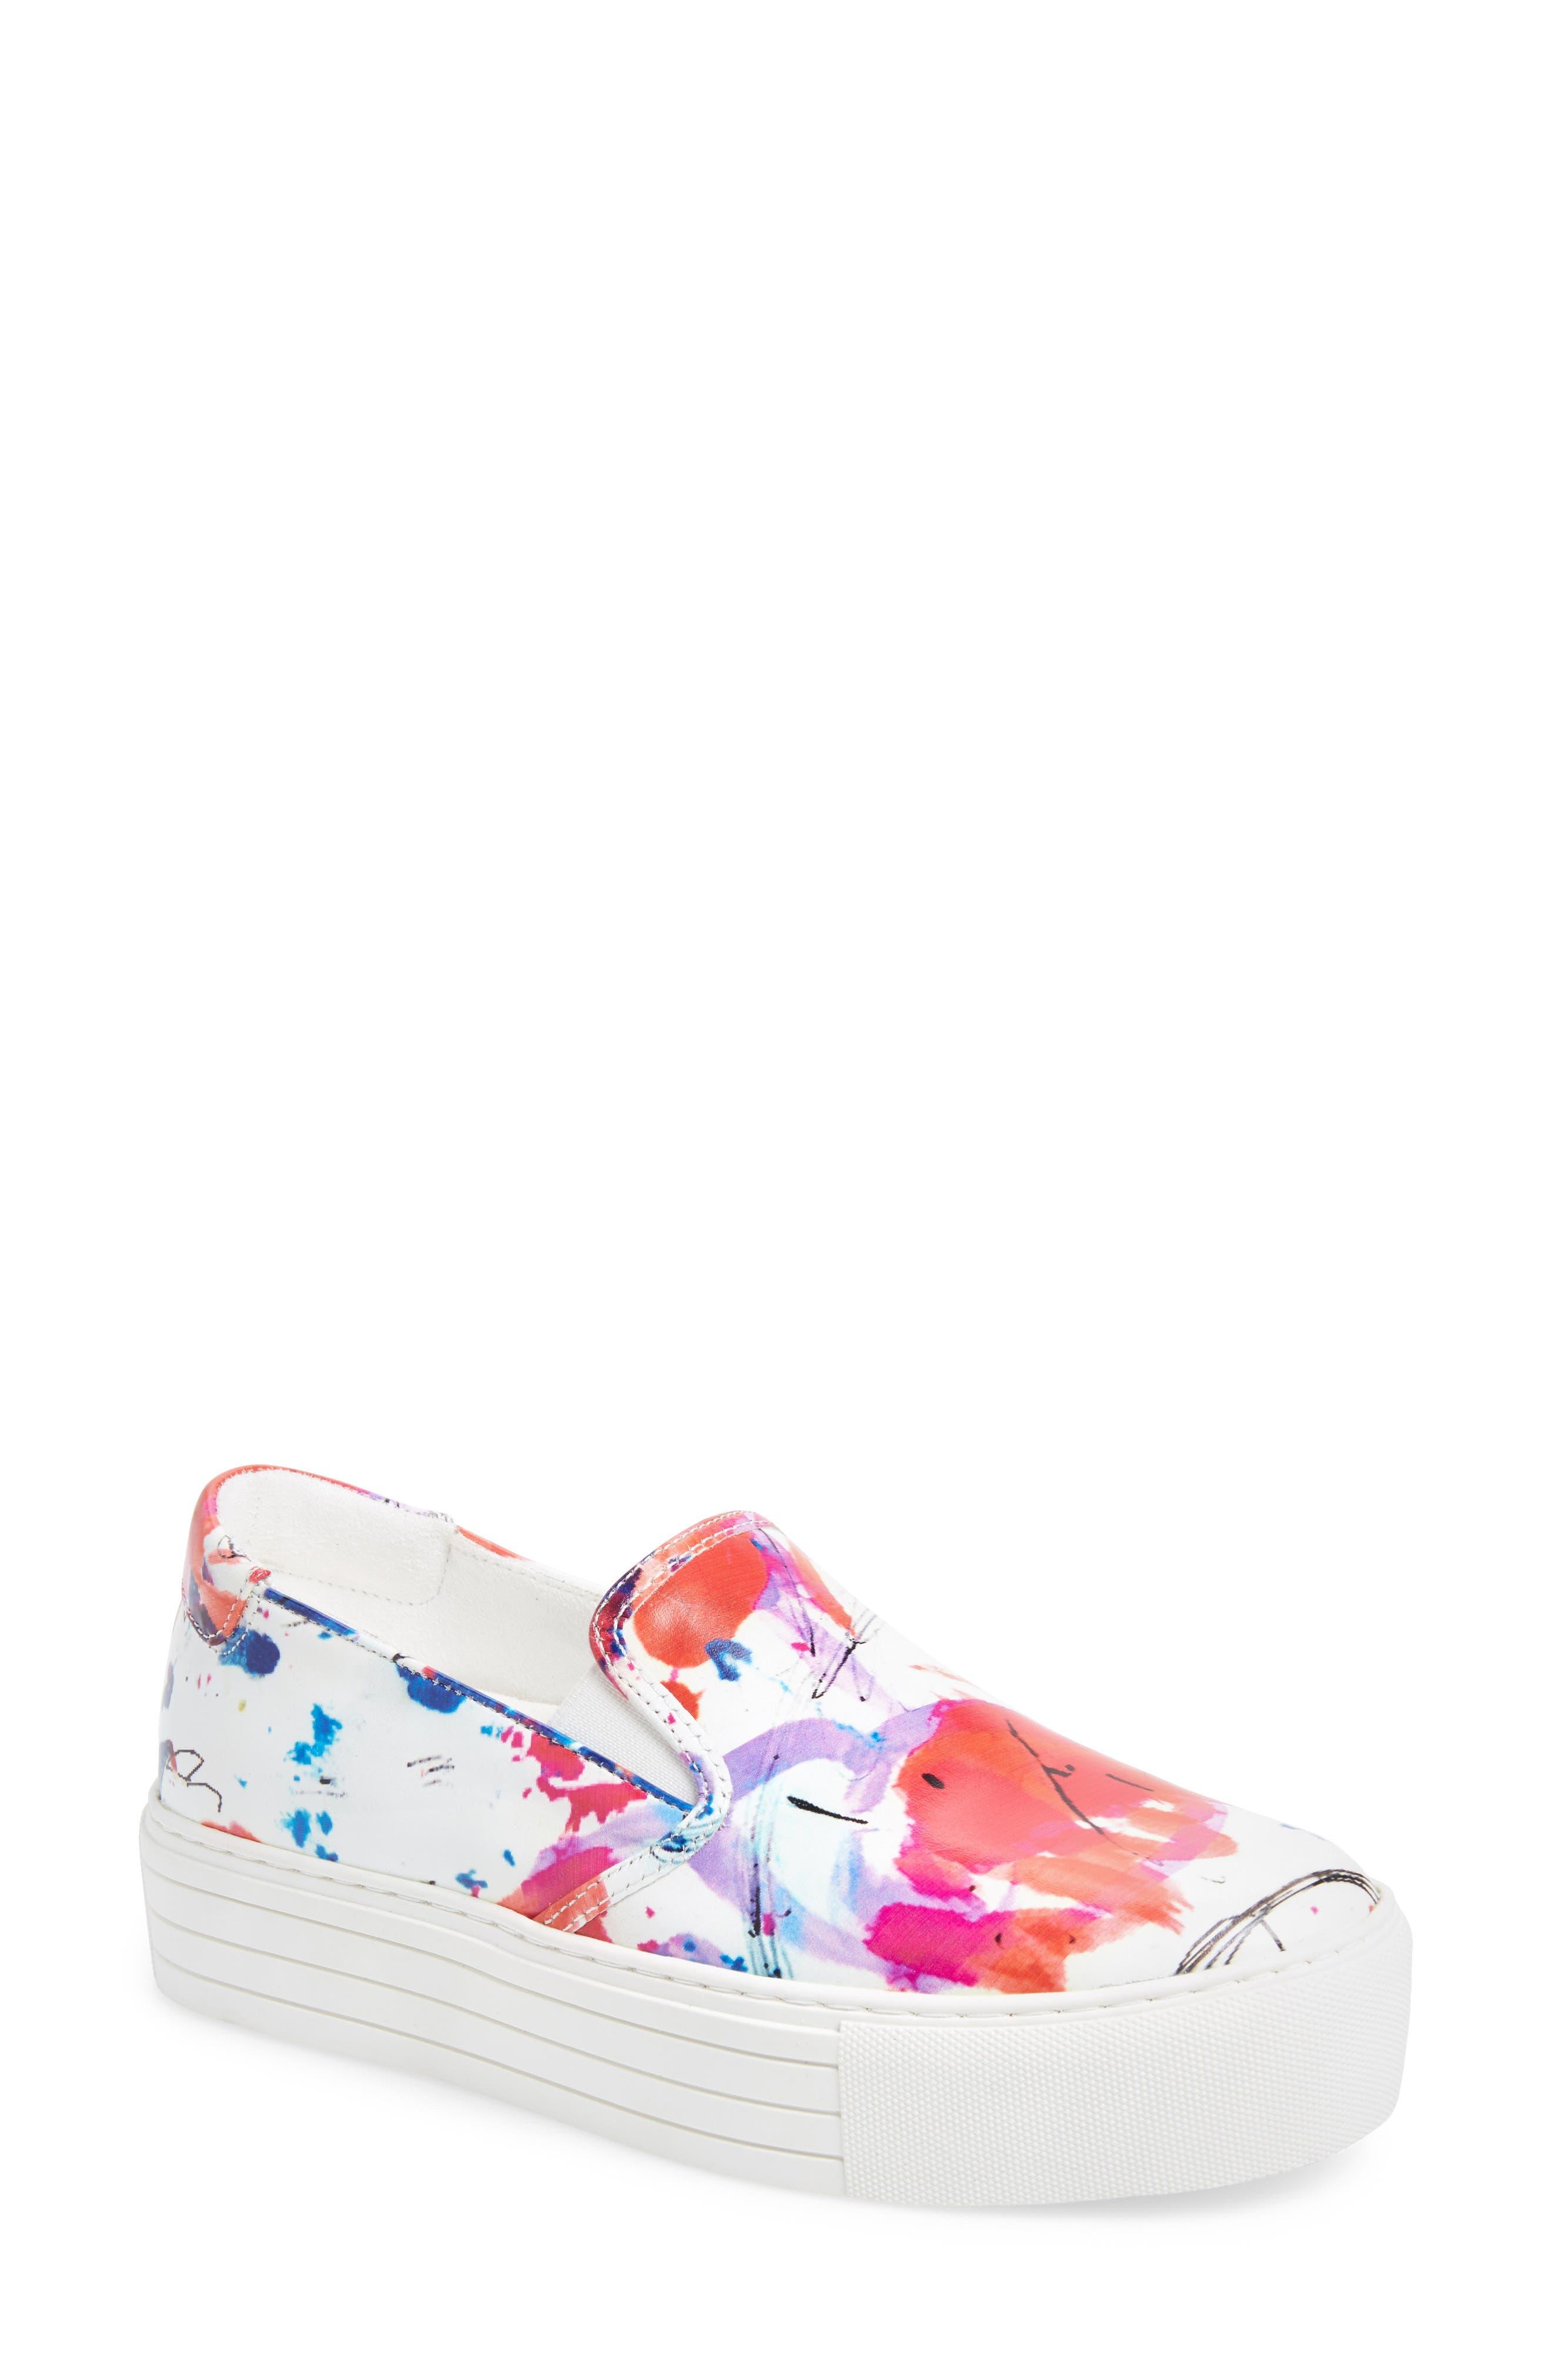 Joanie Slip-On Platform Sneaker,                             Main thumbnail 1, color,                             White Multi Print Leather